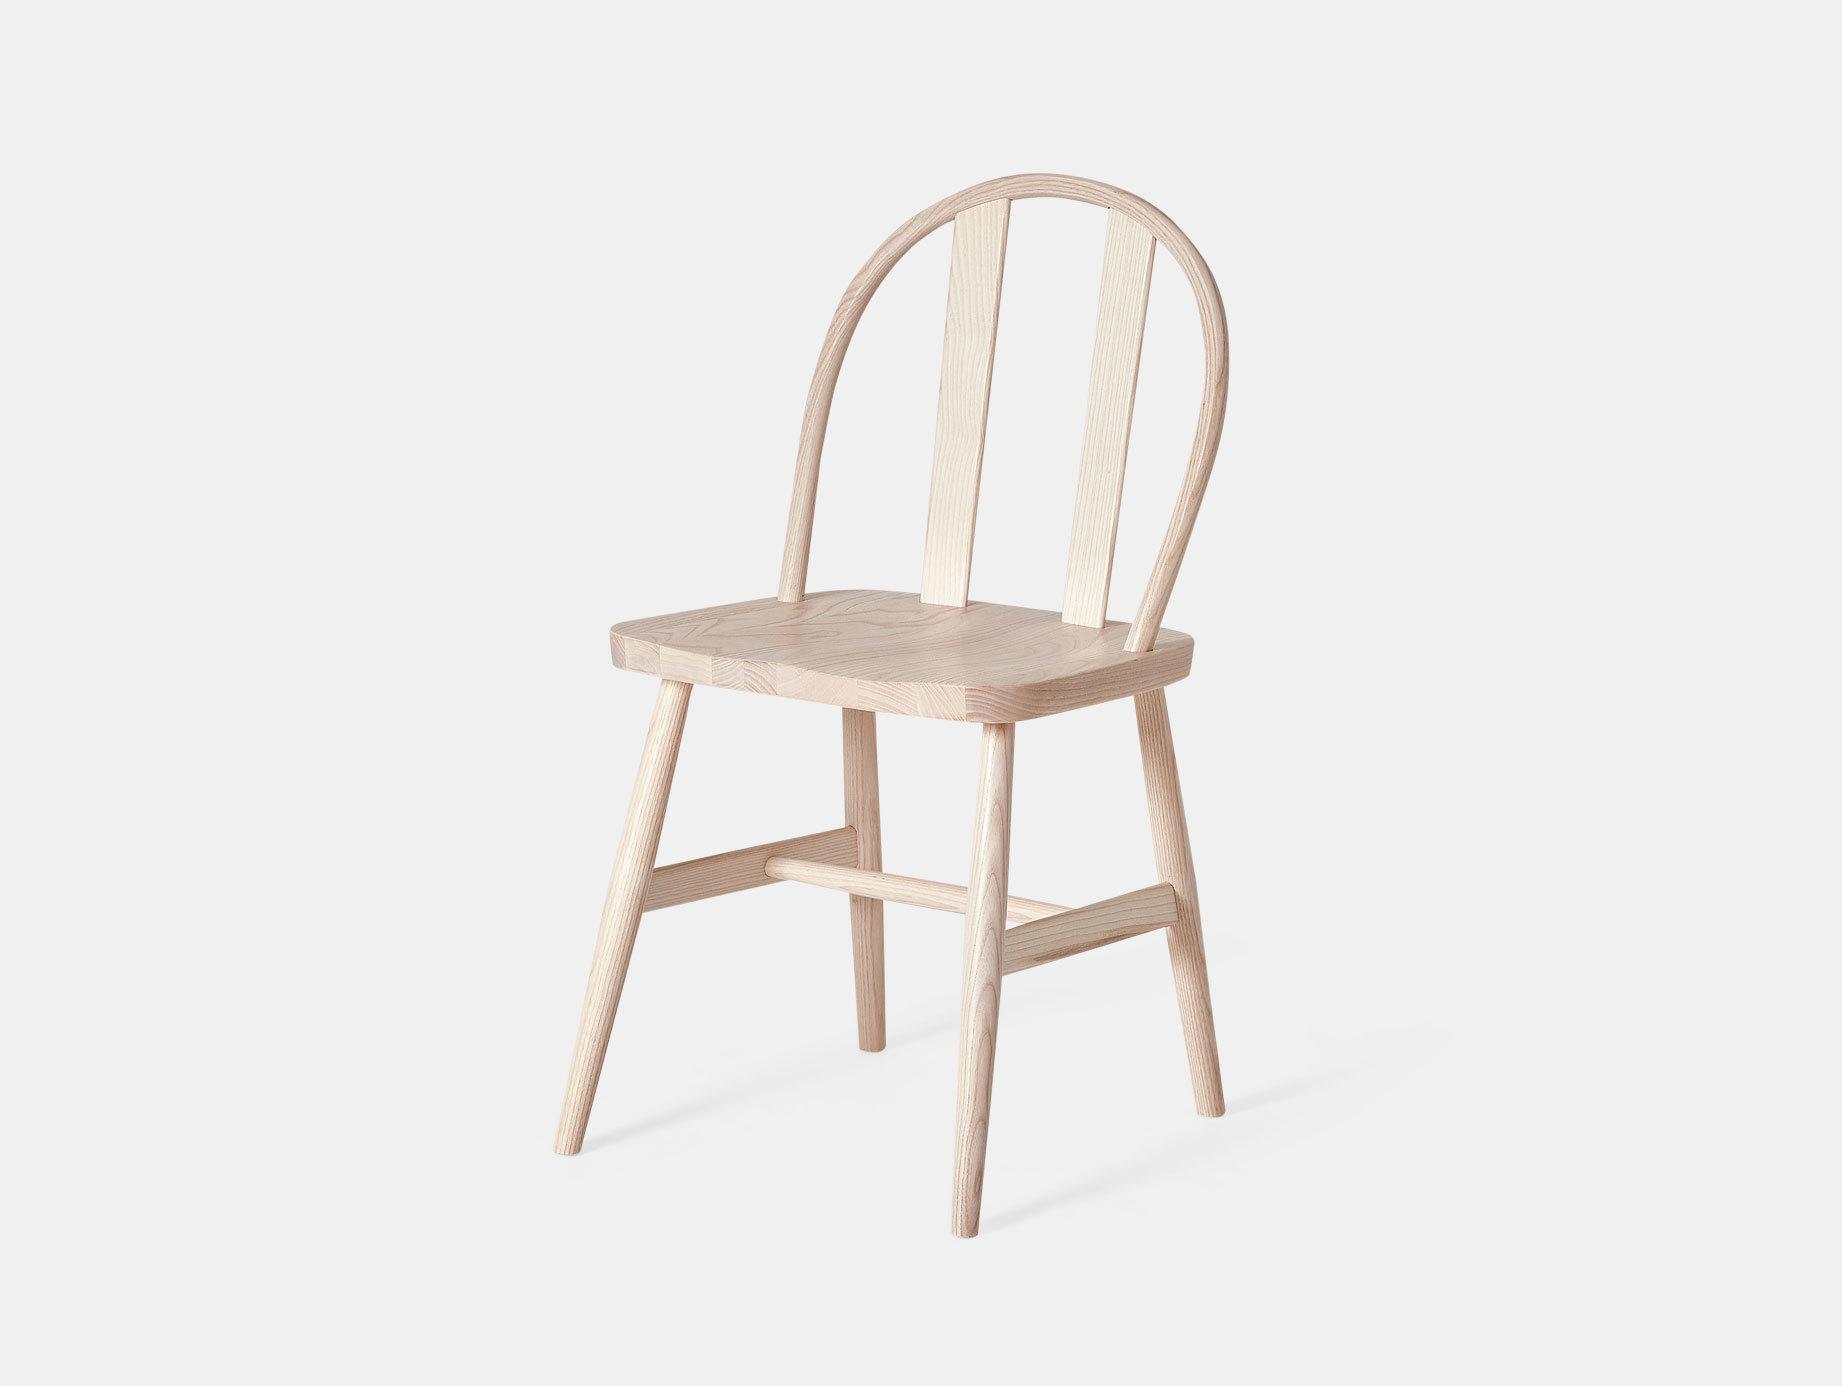 Bird Chair image 1